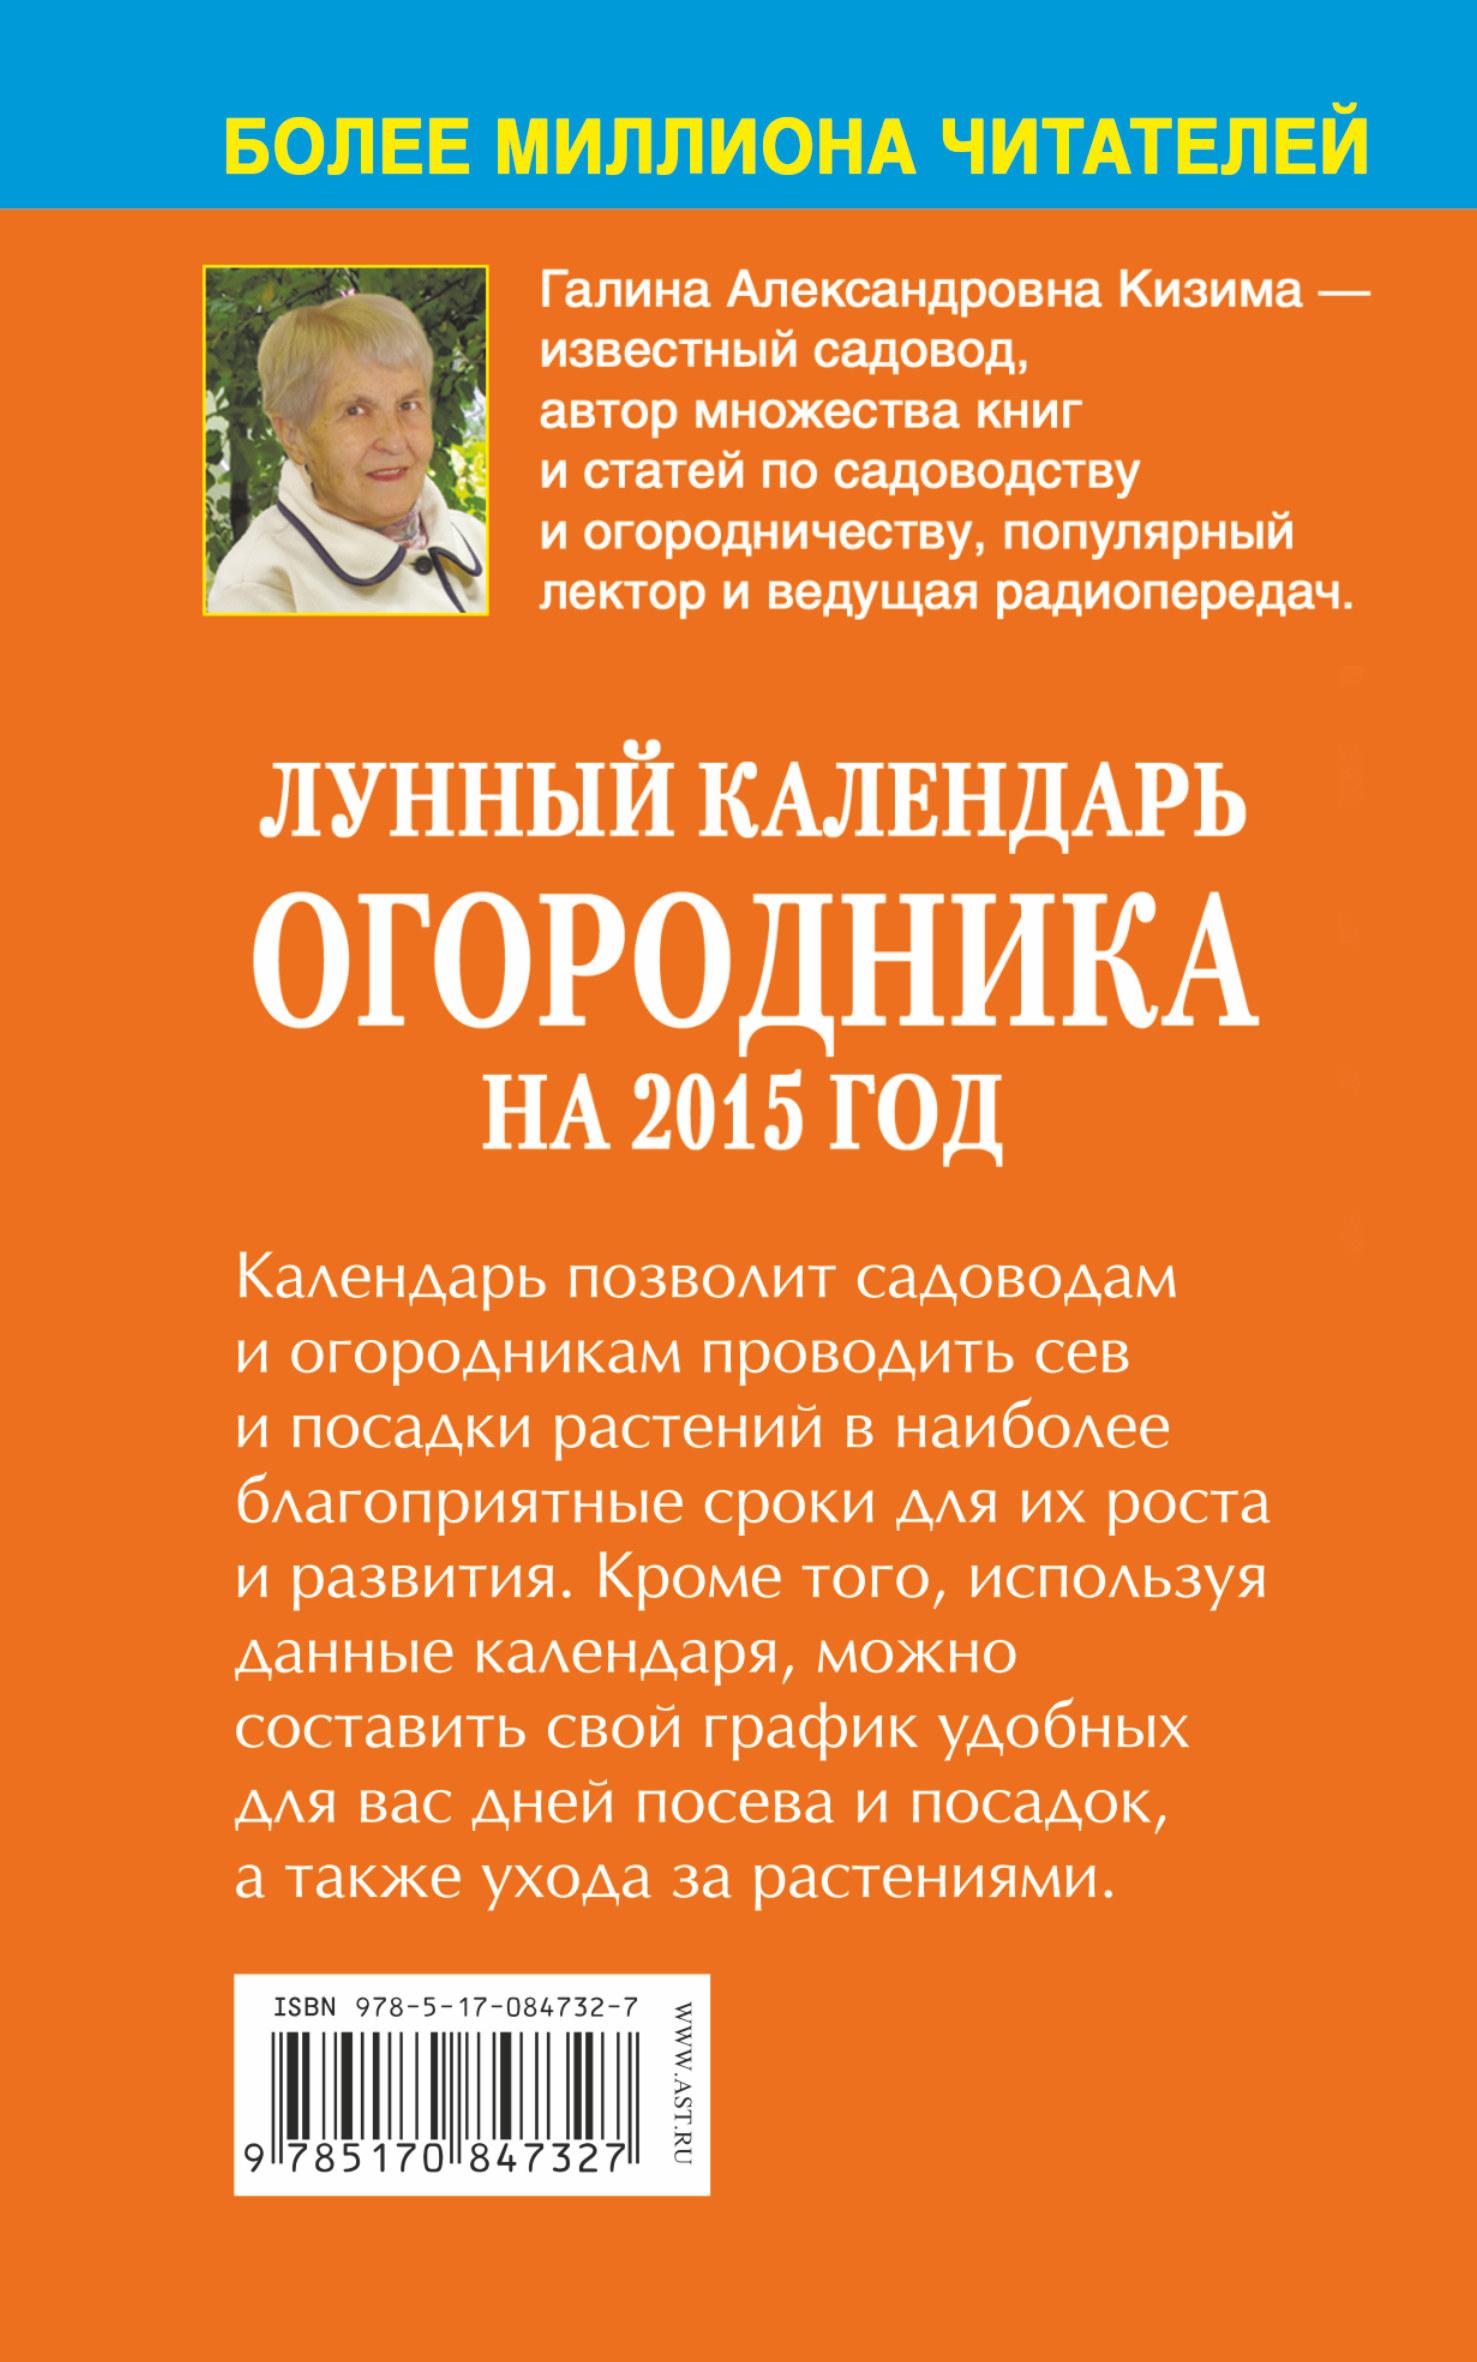 Лунный календарь огородника на 2015 год